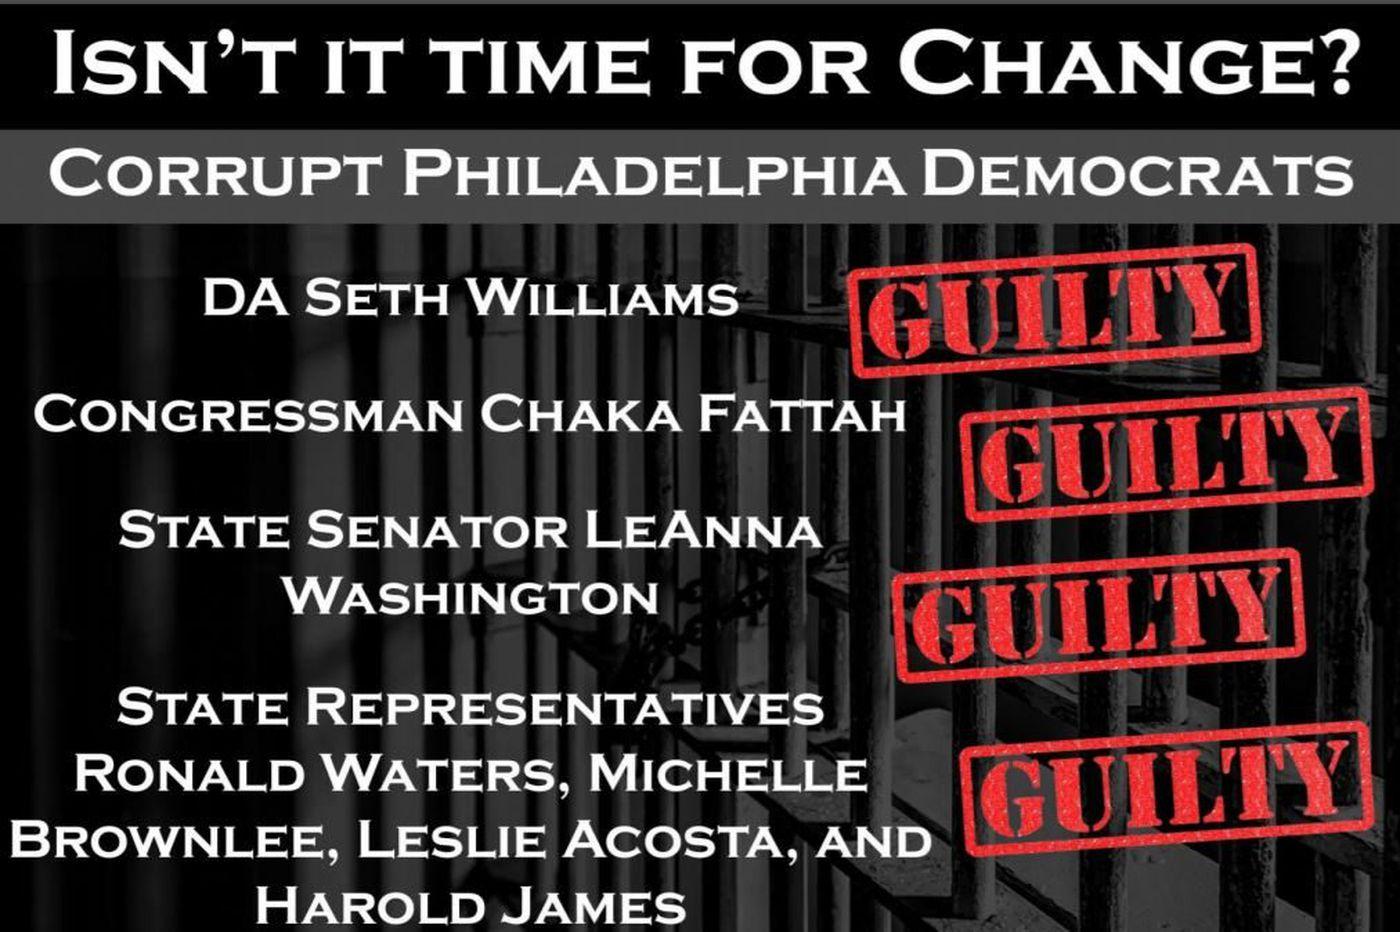 PA GOP cites `corrupt Democrats' (of color) in Philly DA race flier